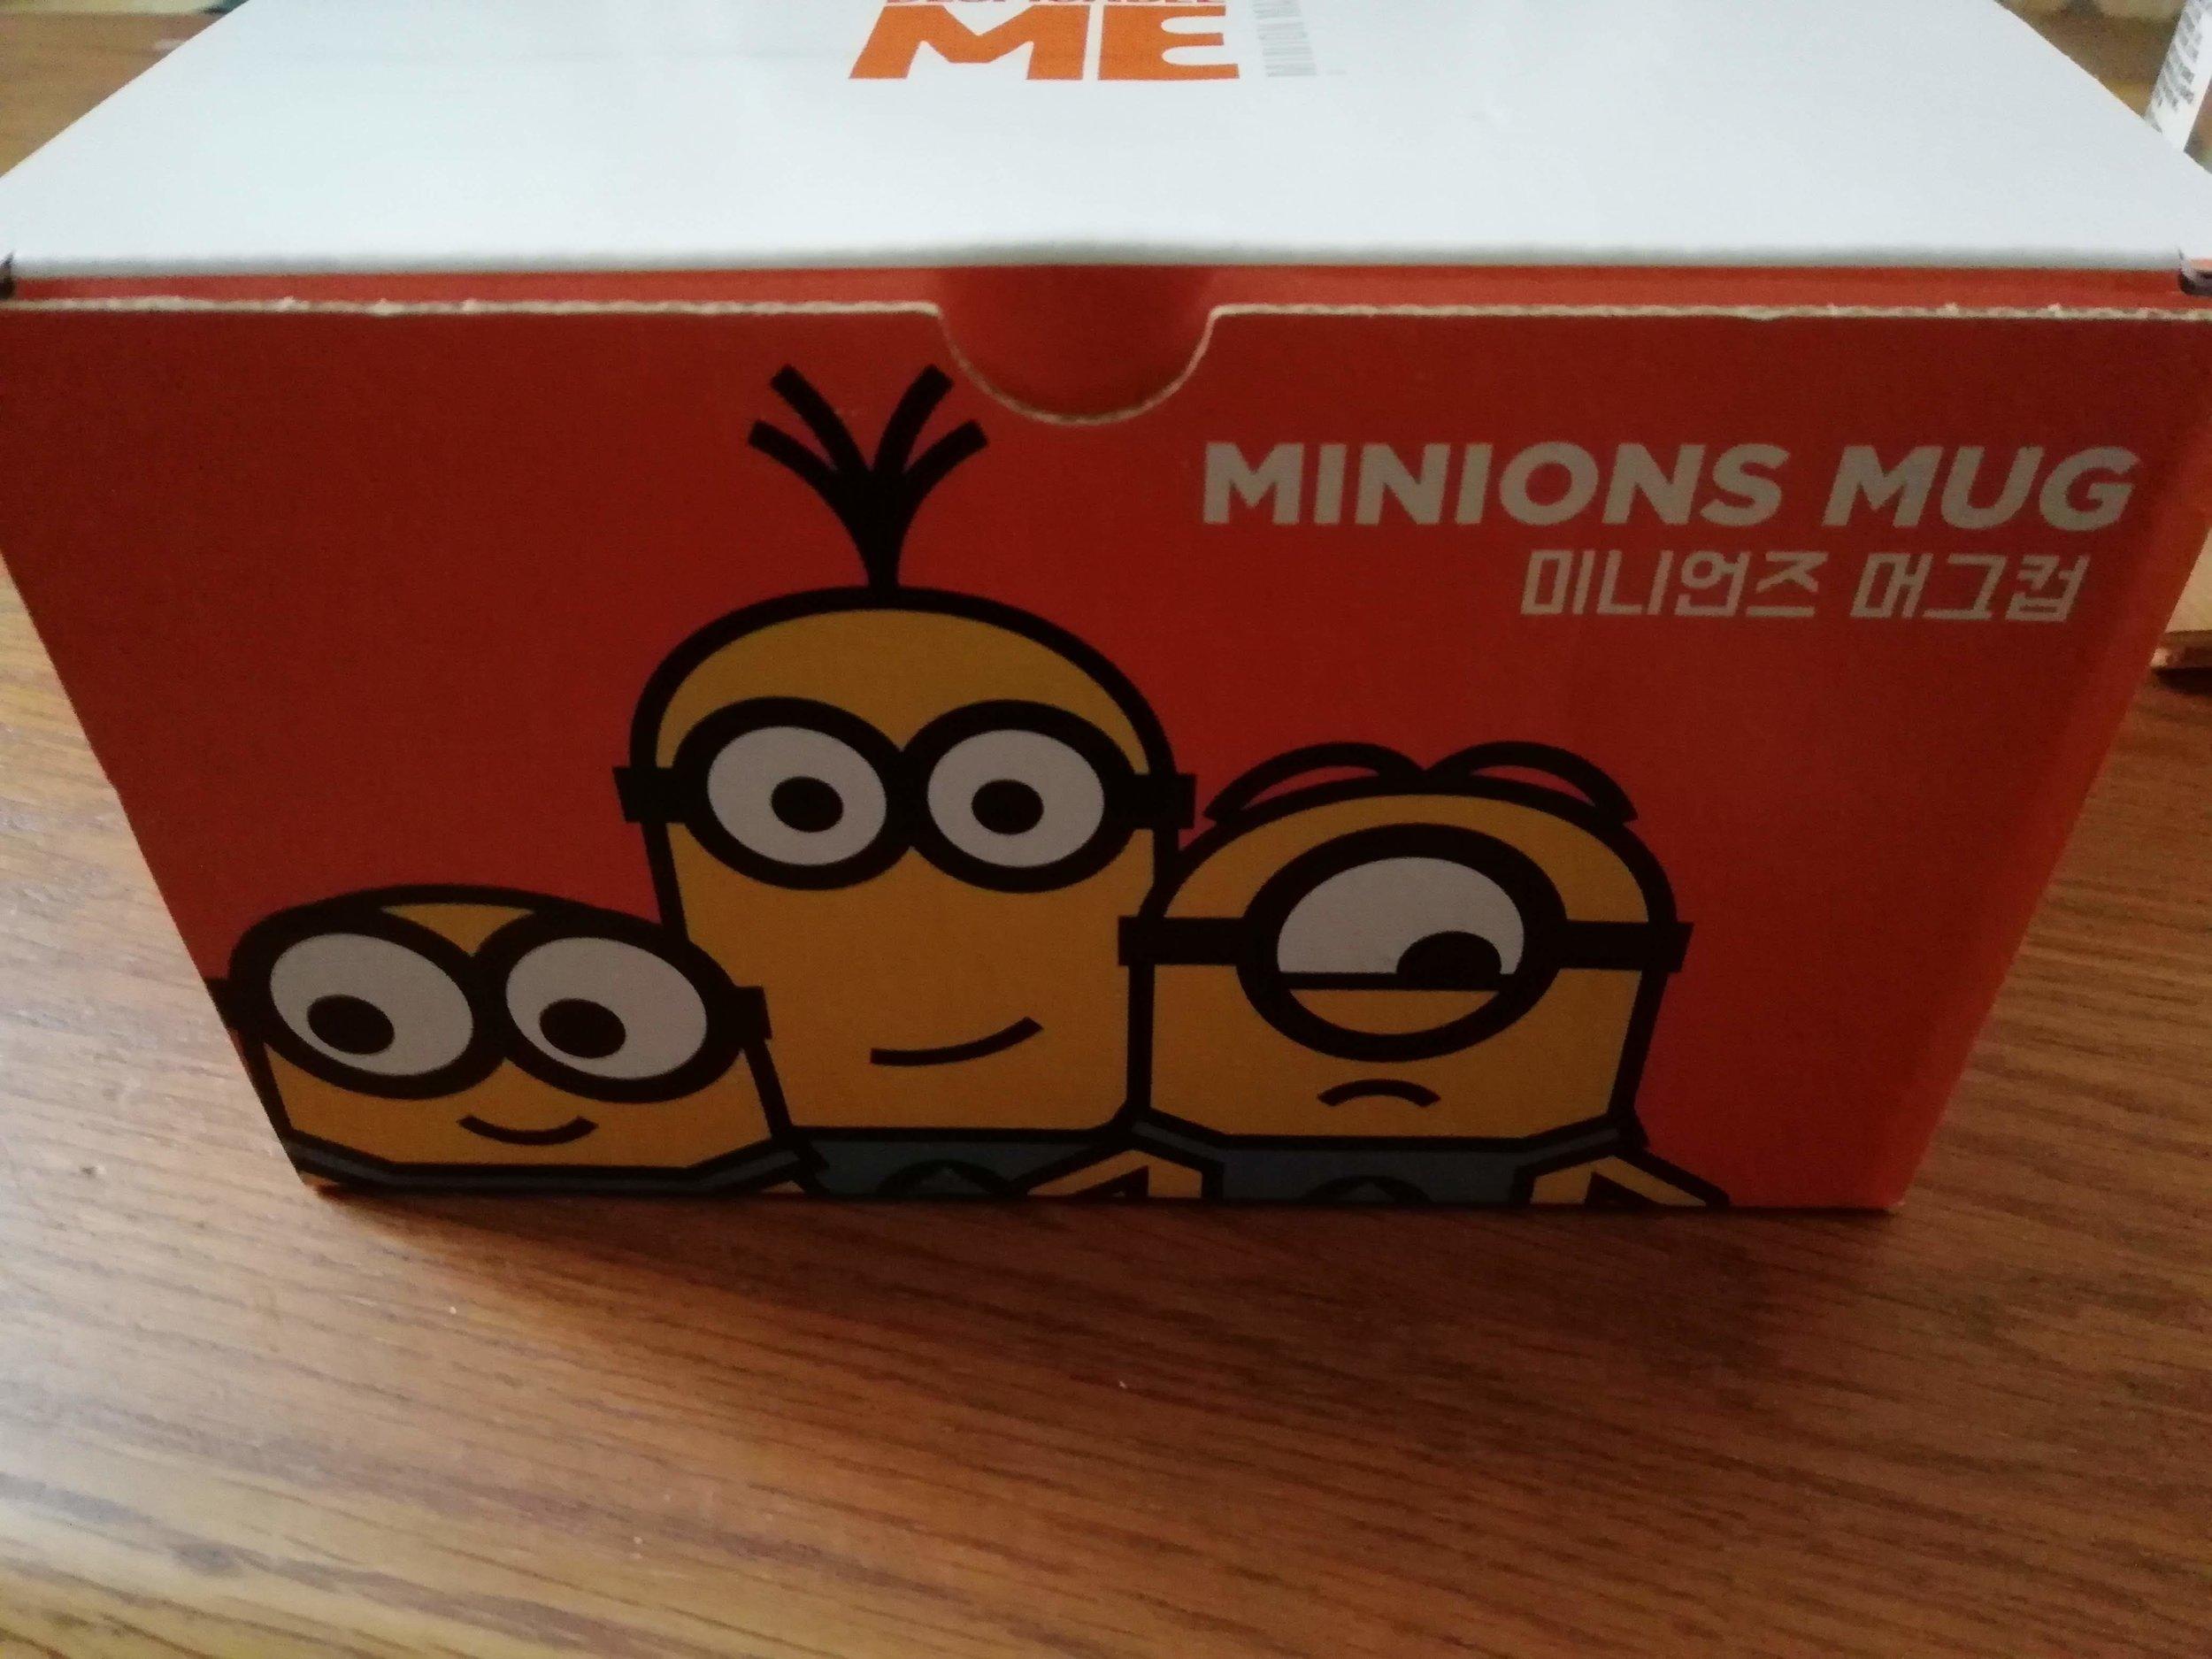 Minions everywhere